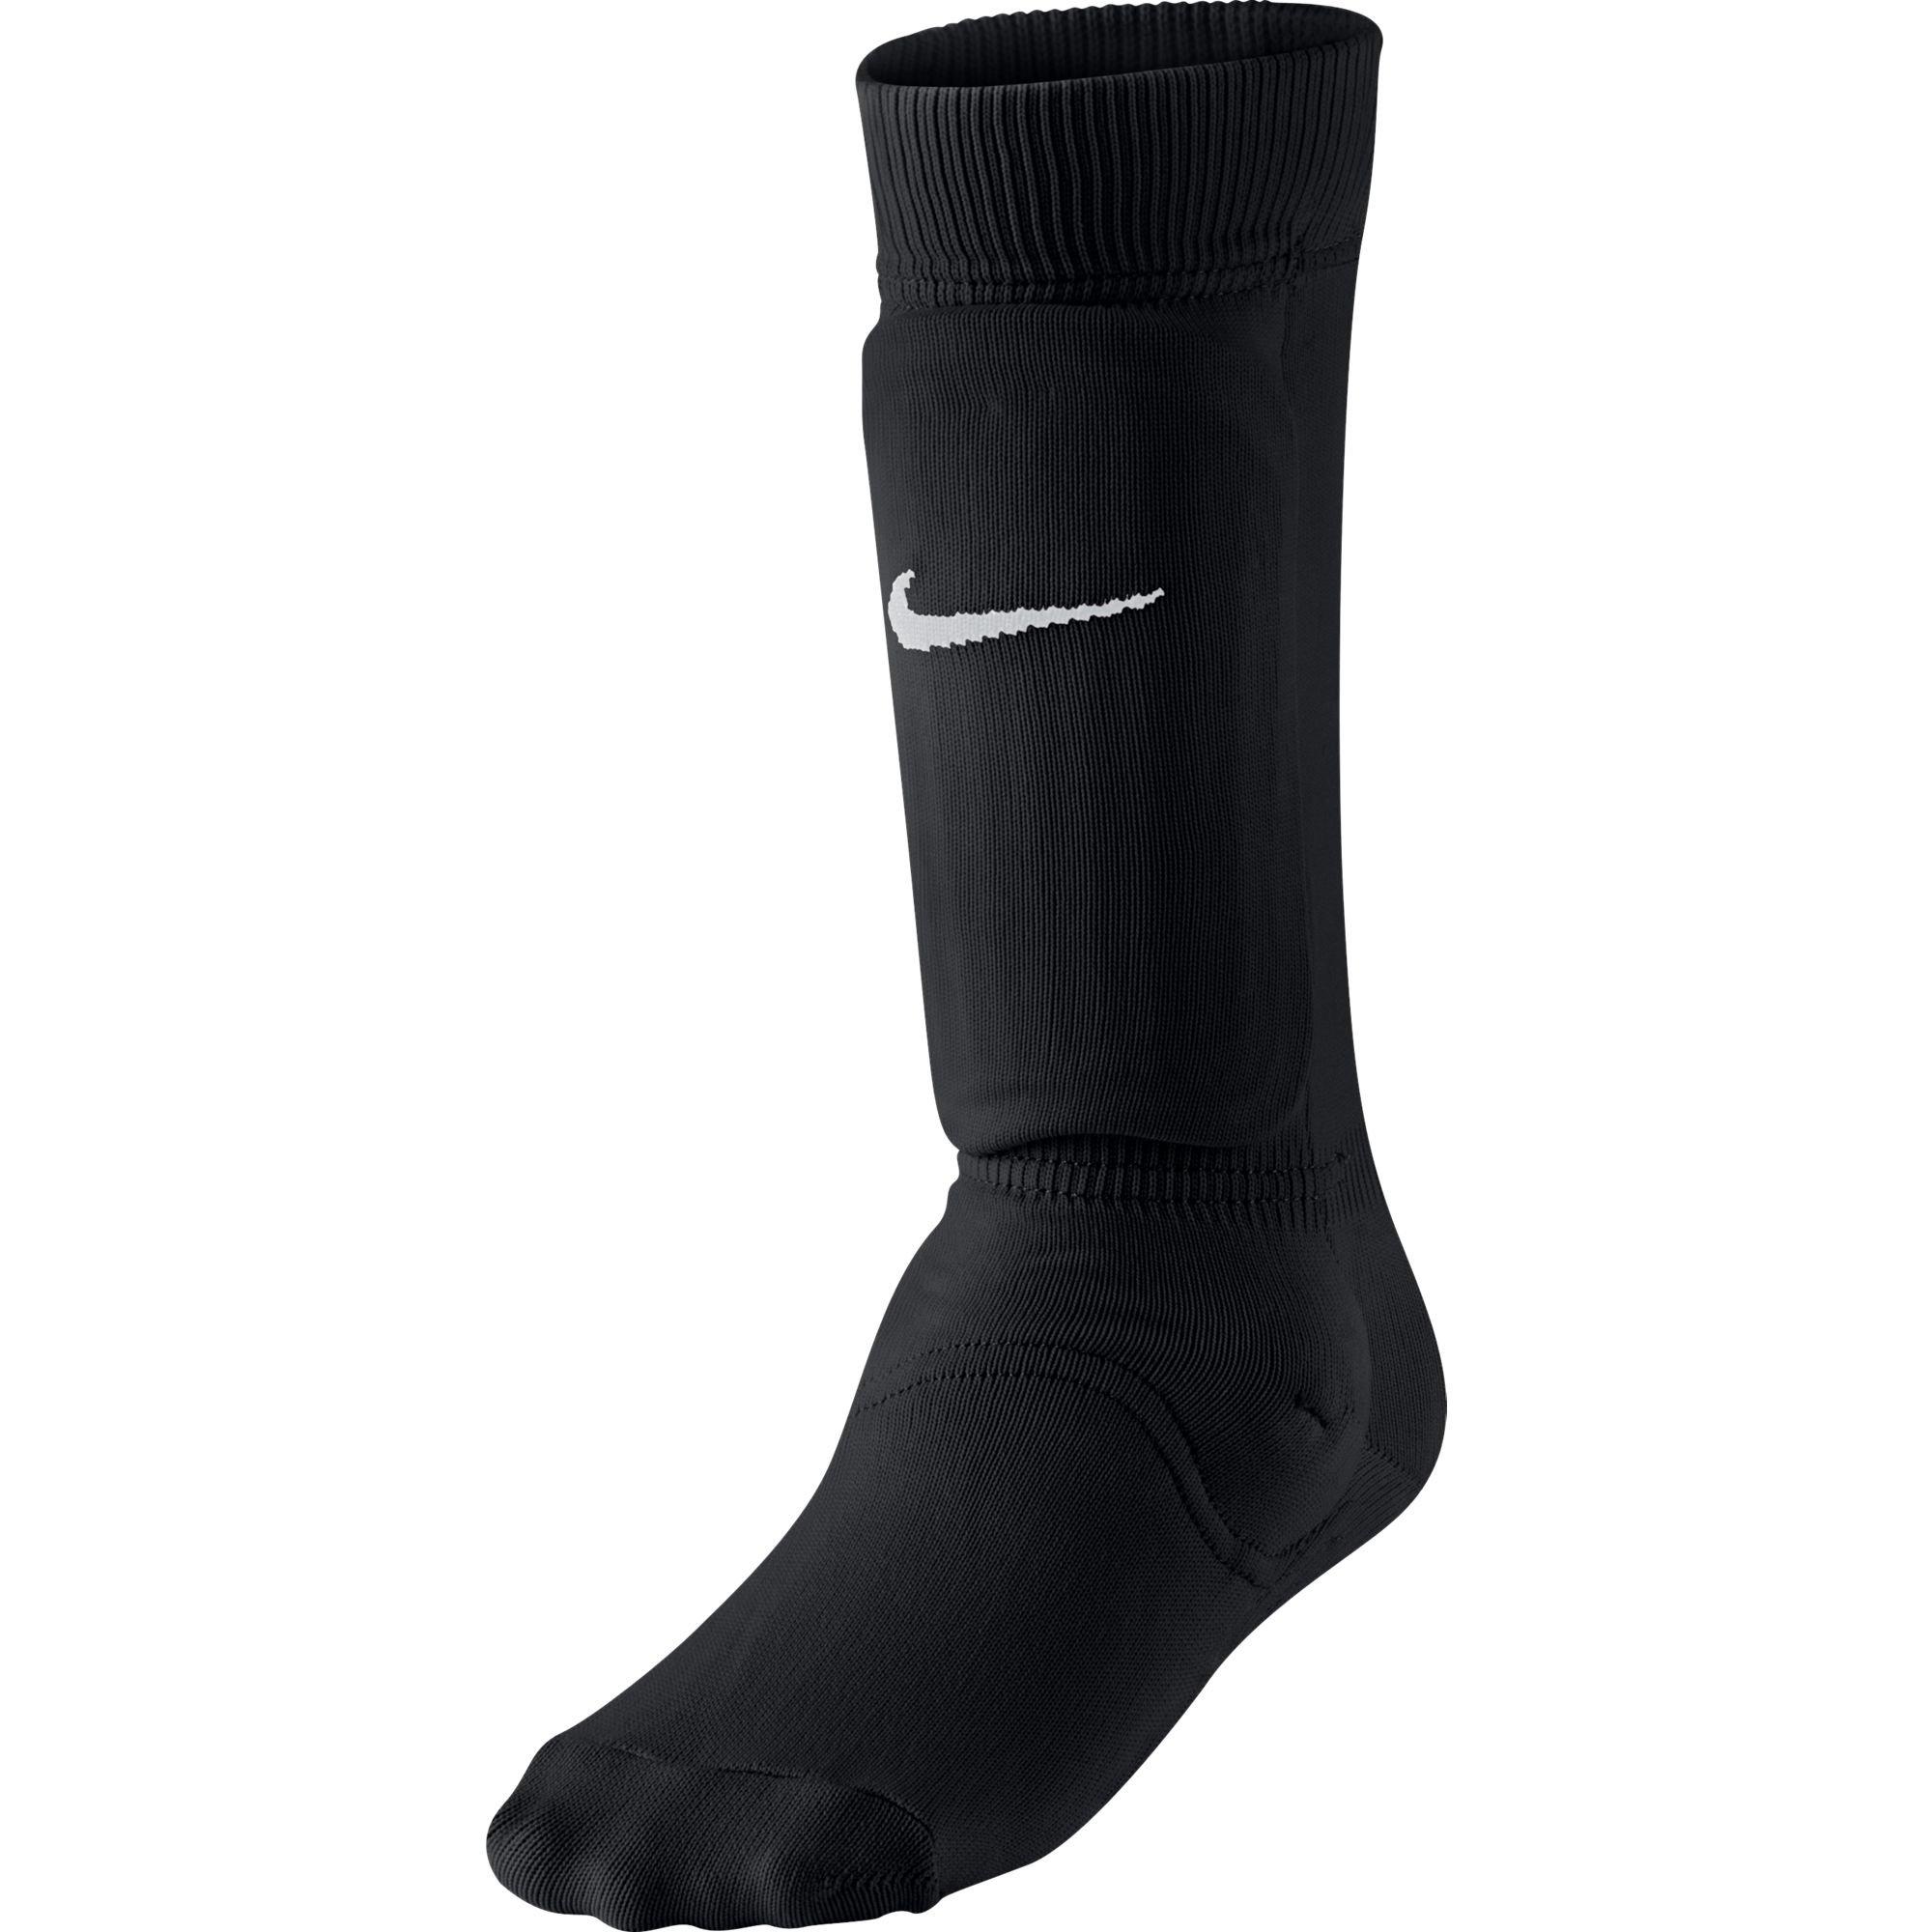 NIKE Kids' Unisex Shin Sock Sleeve, Black/White, Small/Medium